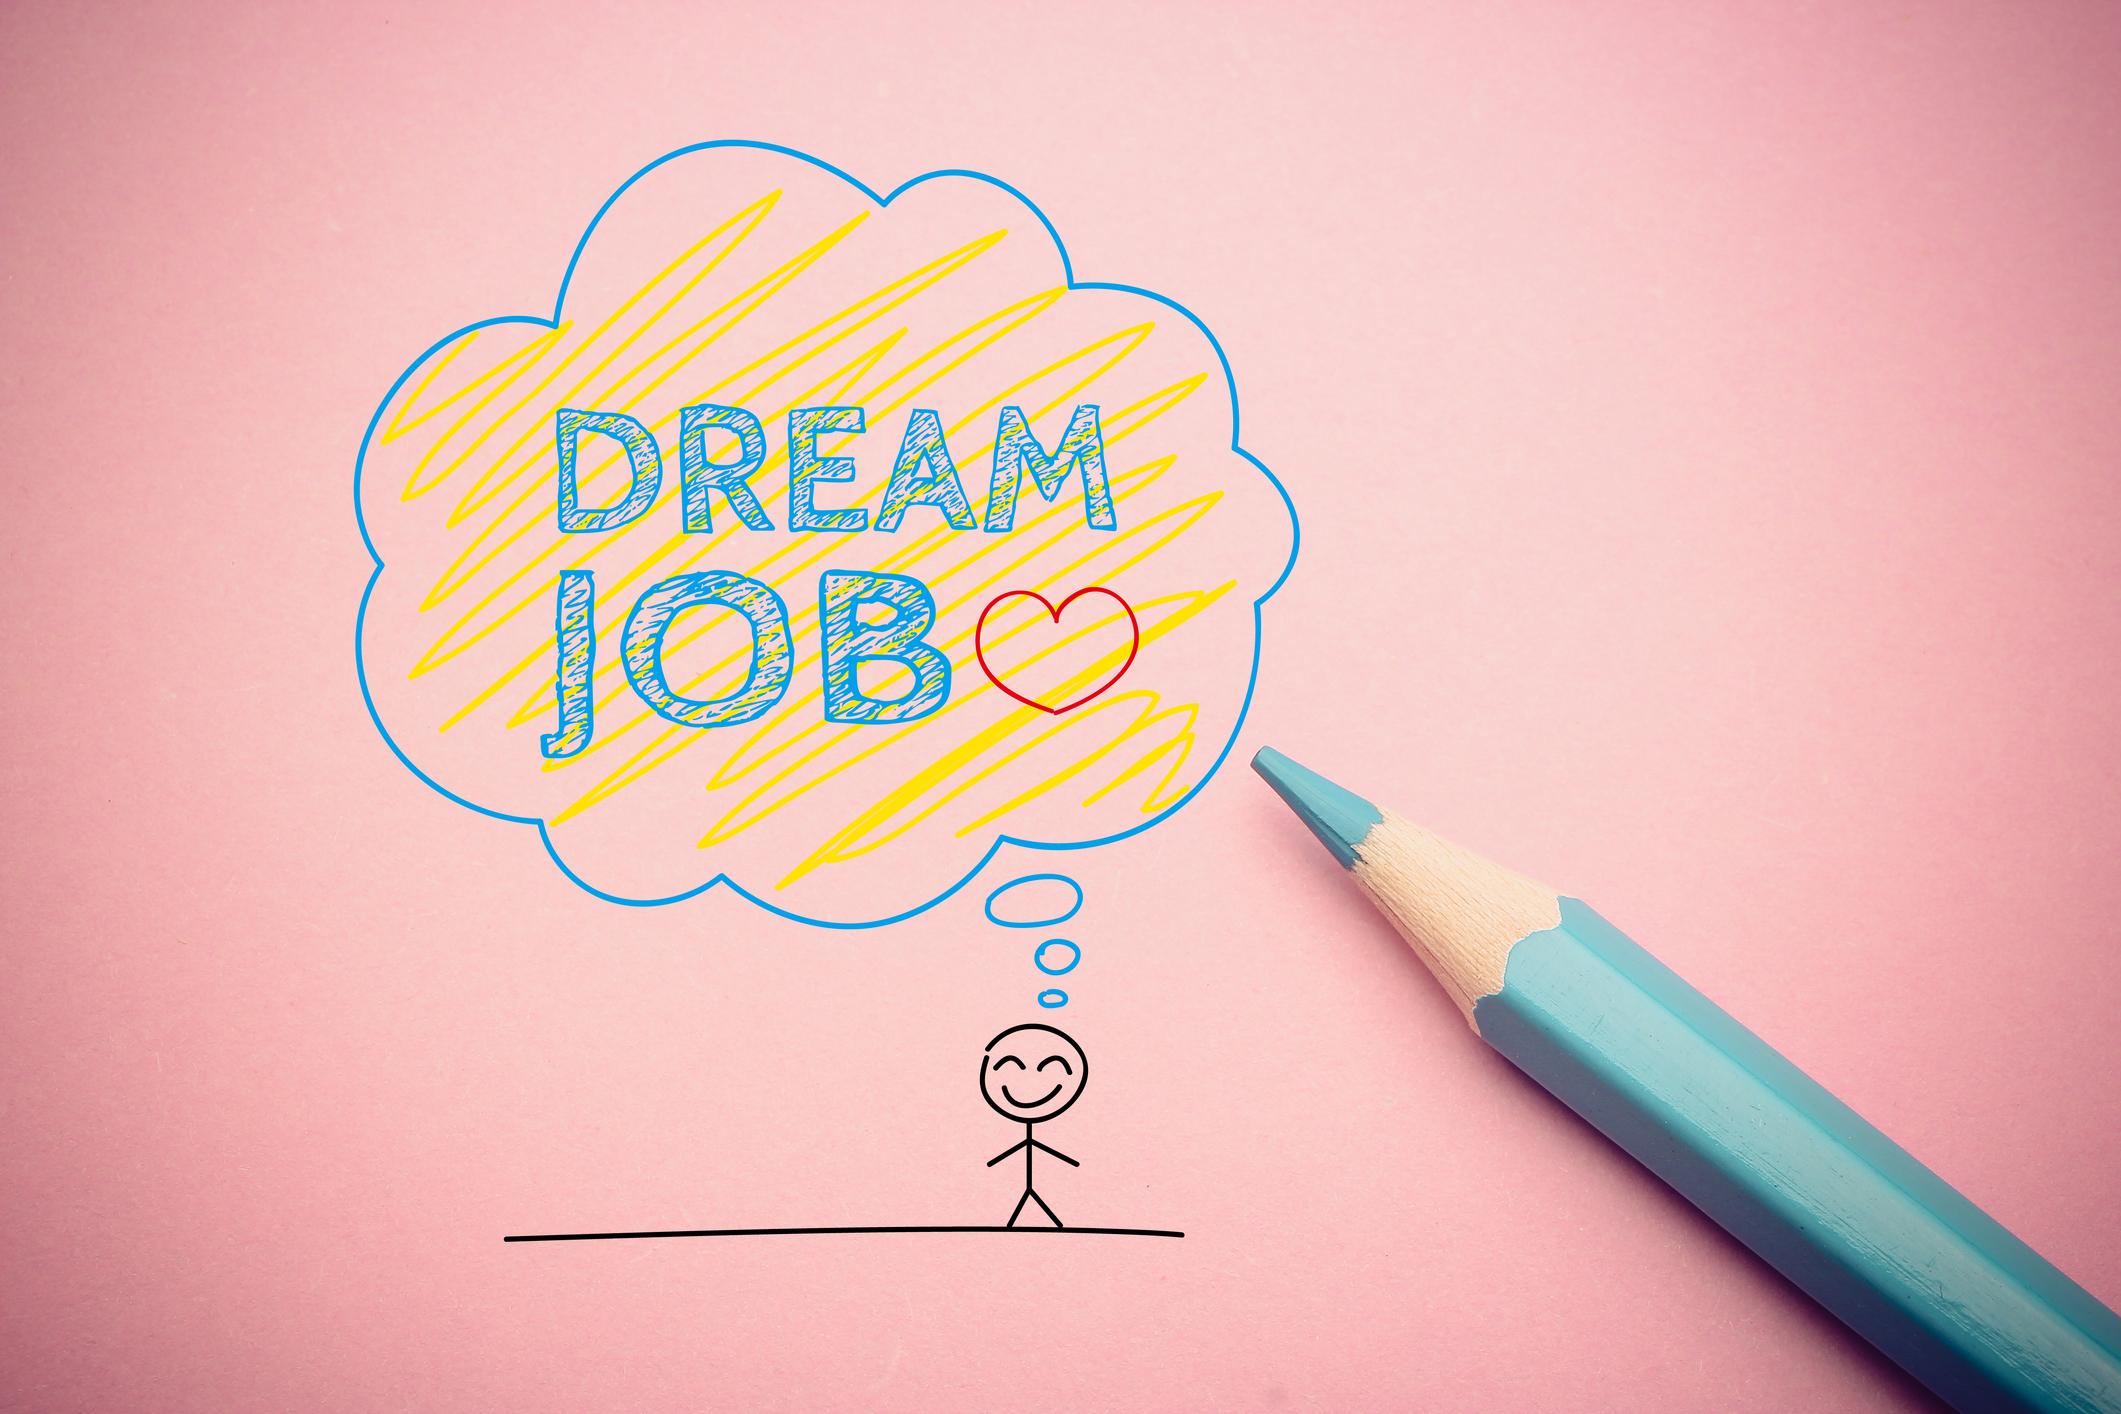 Cartoon character thinking of a dream job